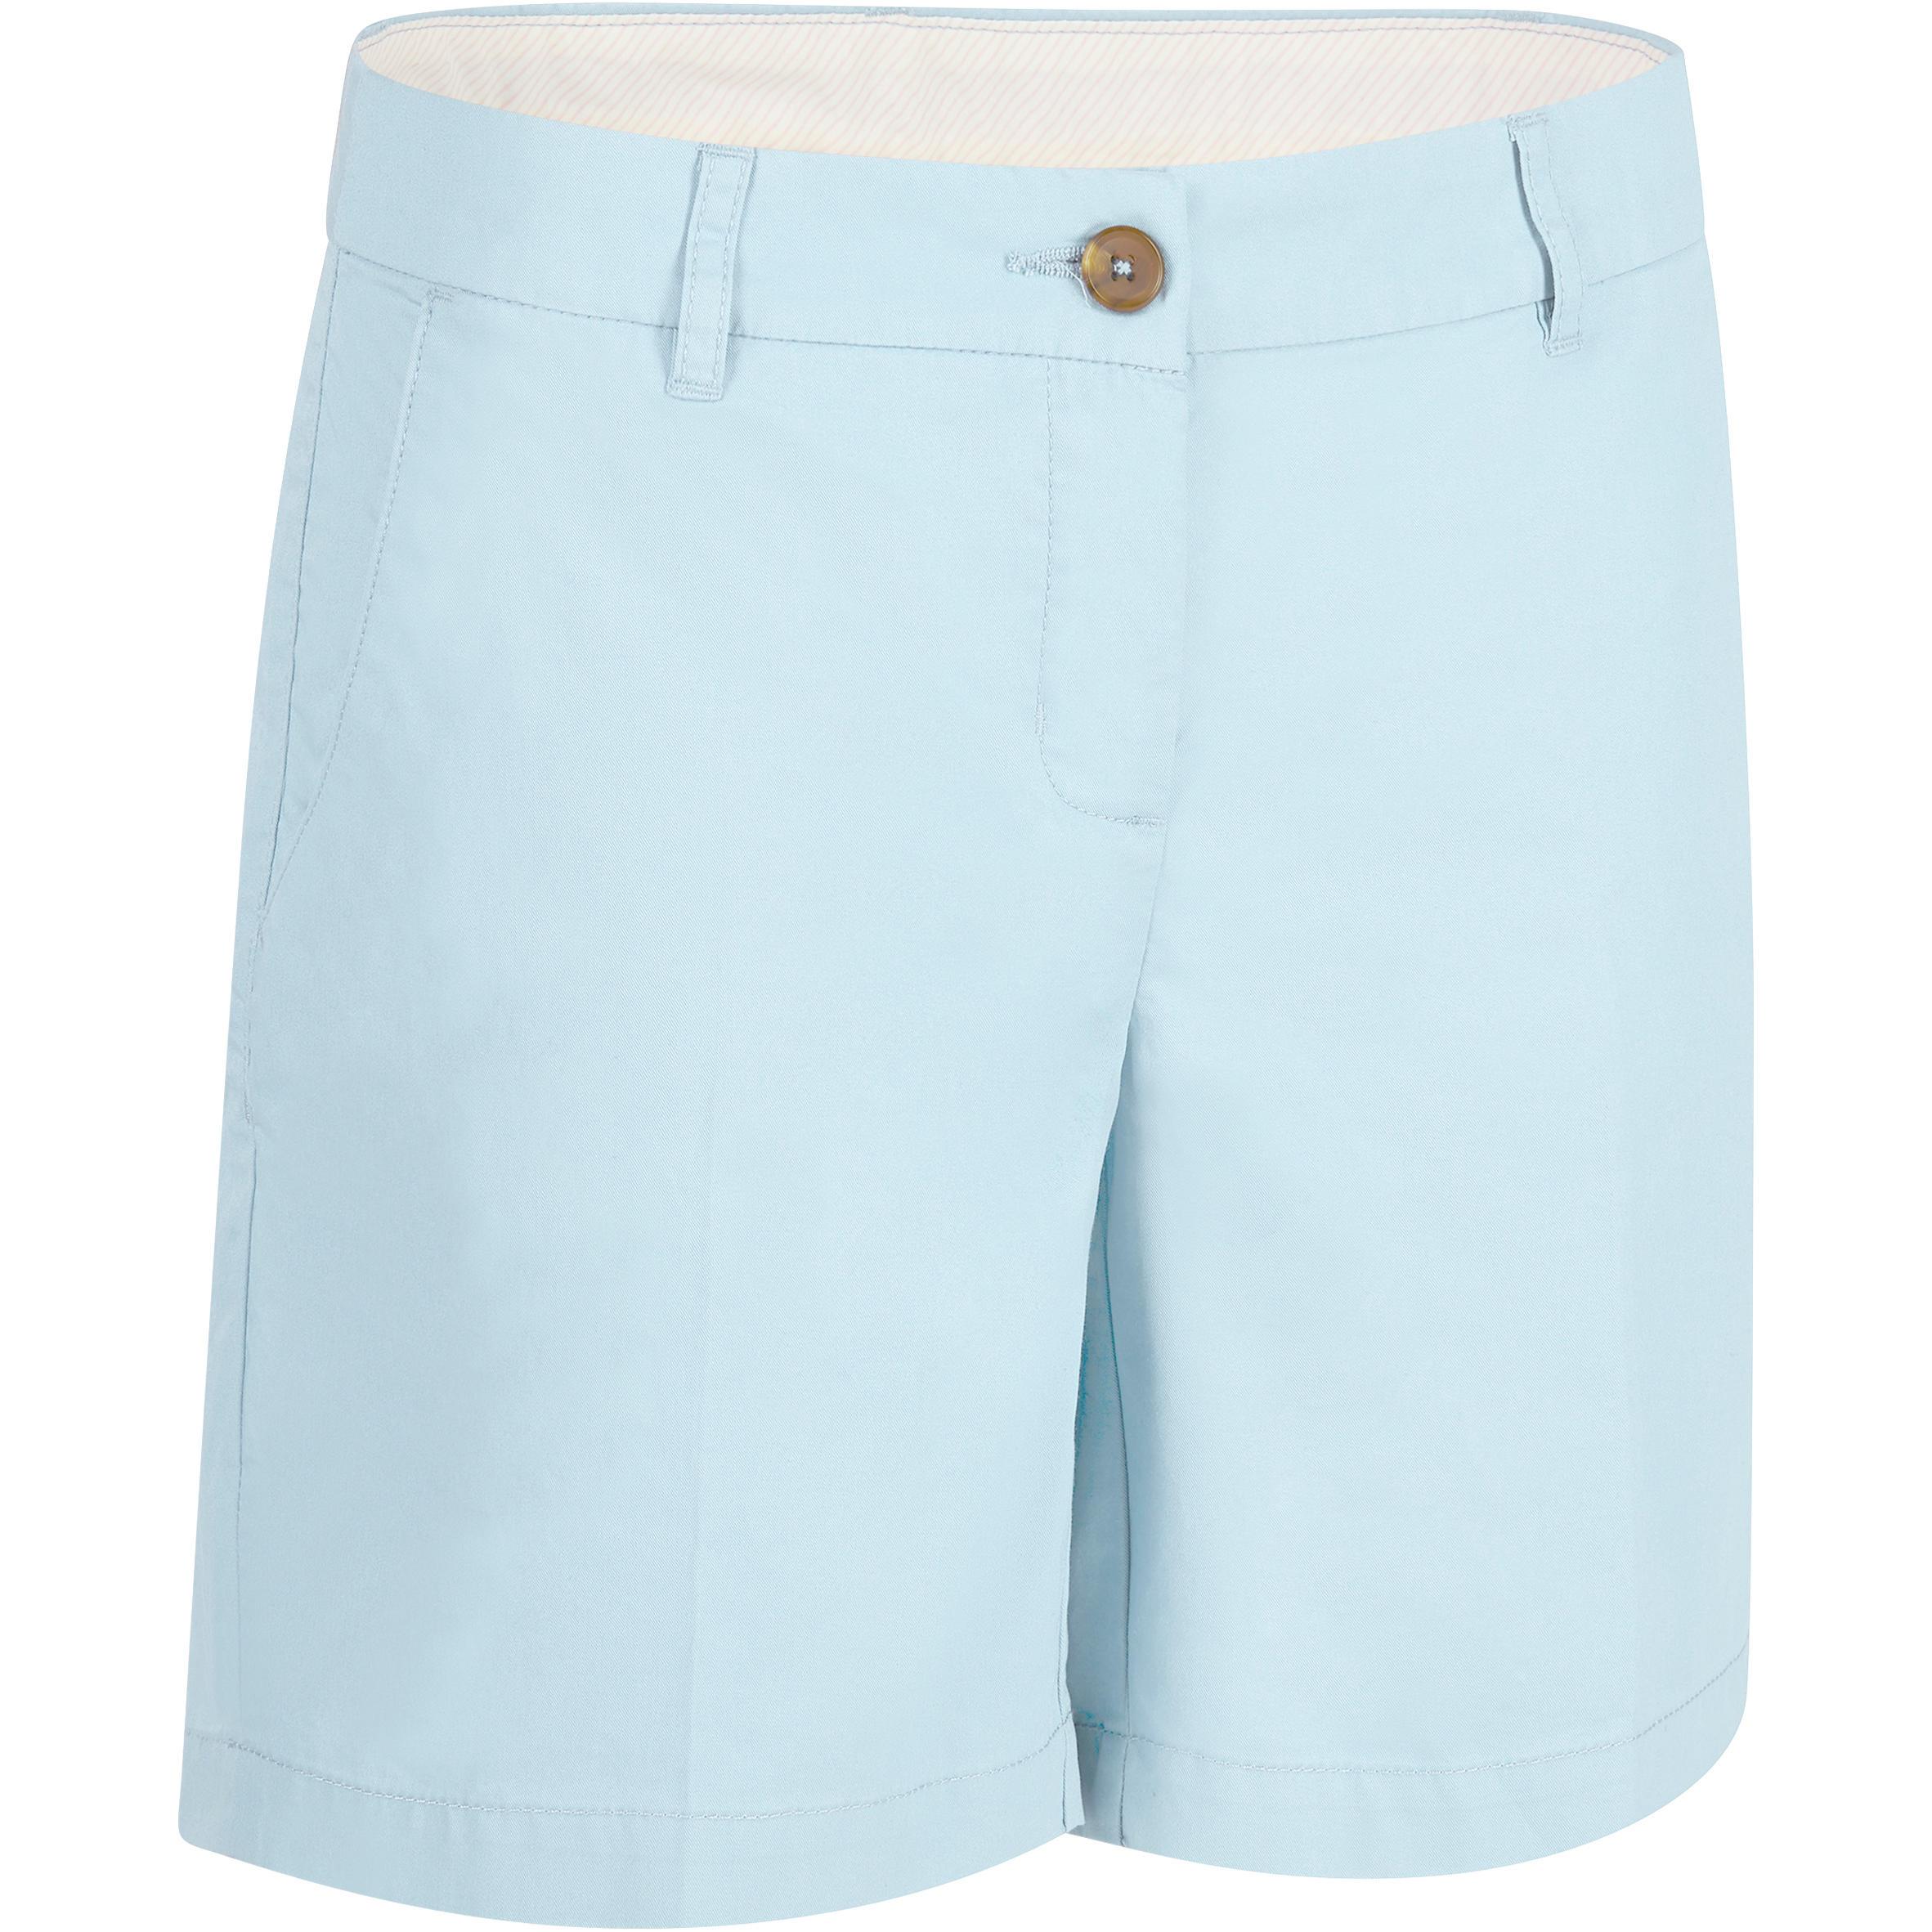 Short de golf femme 500 bleu ciel